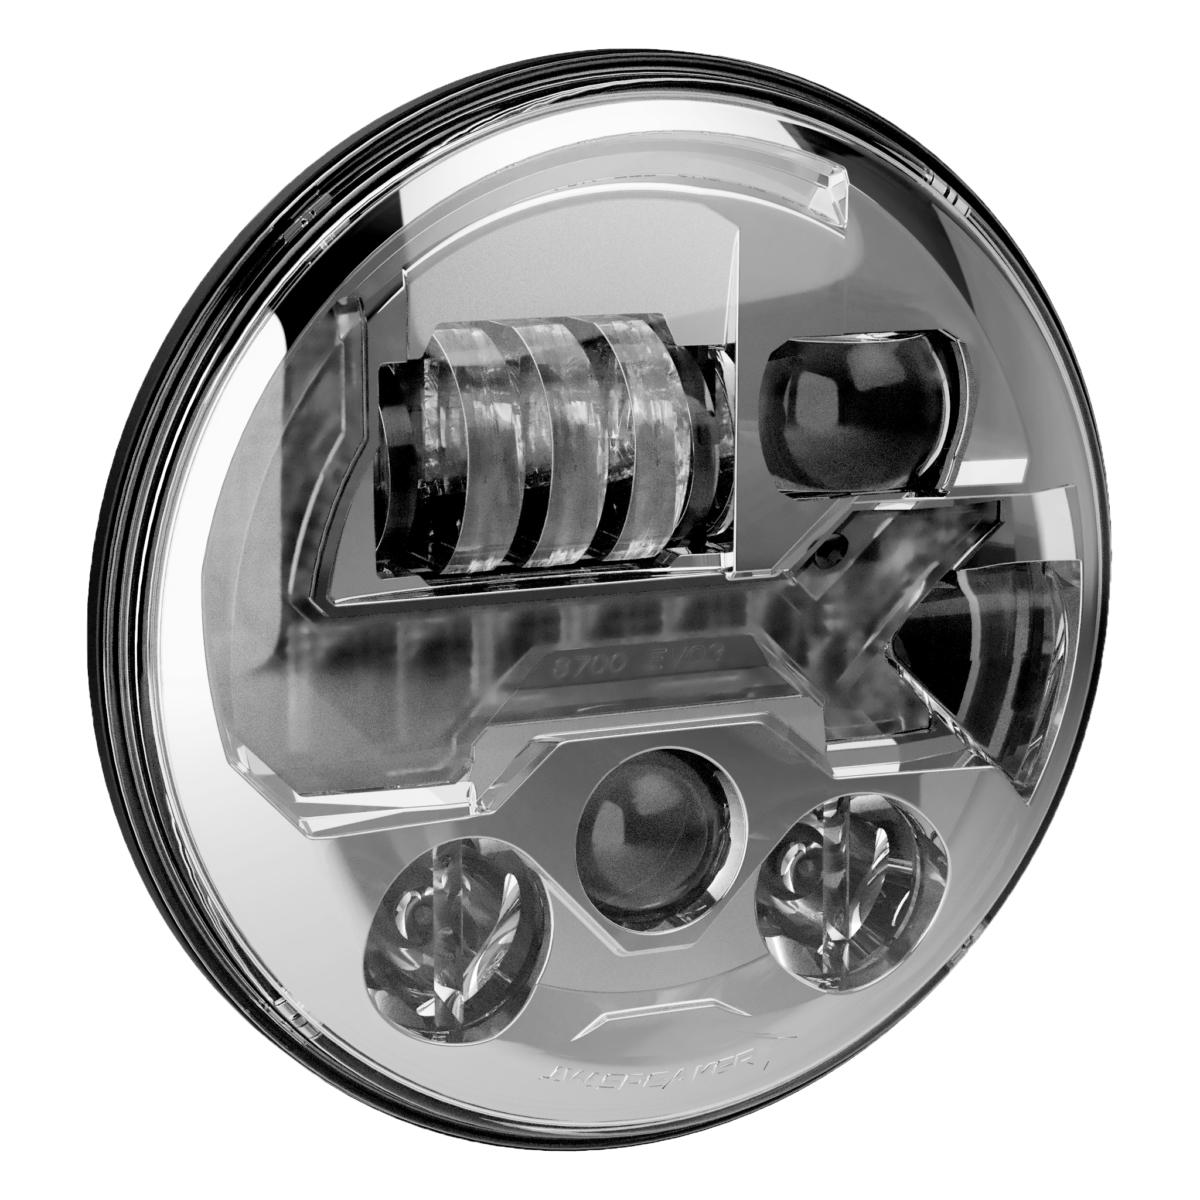 LED Headlights – Model 8700 EVO 3